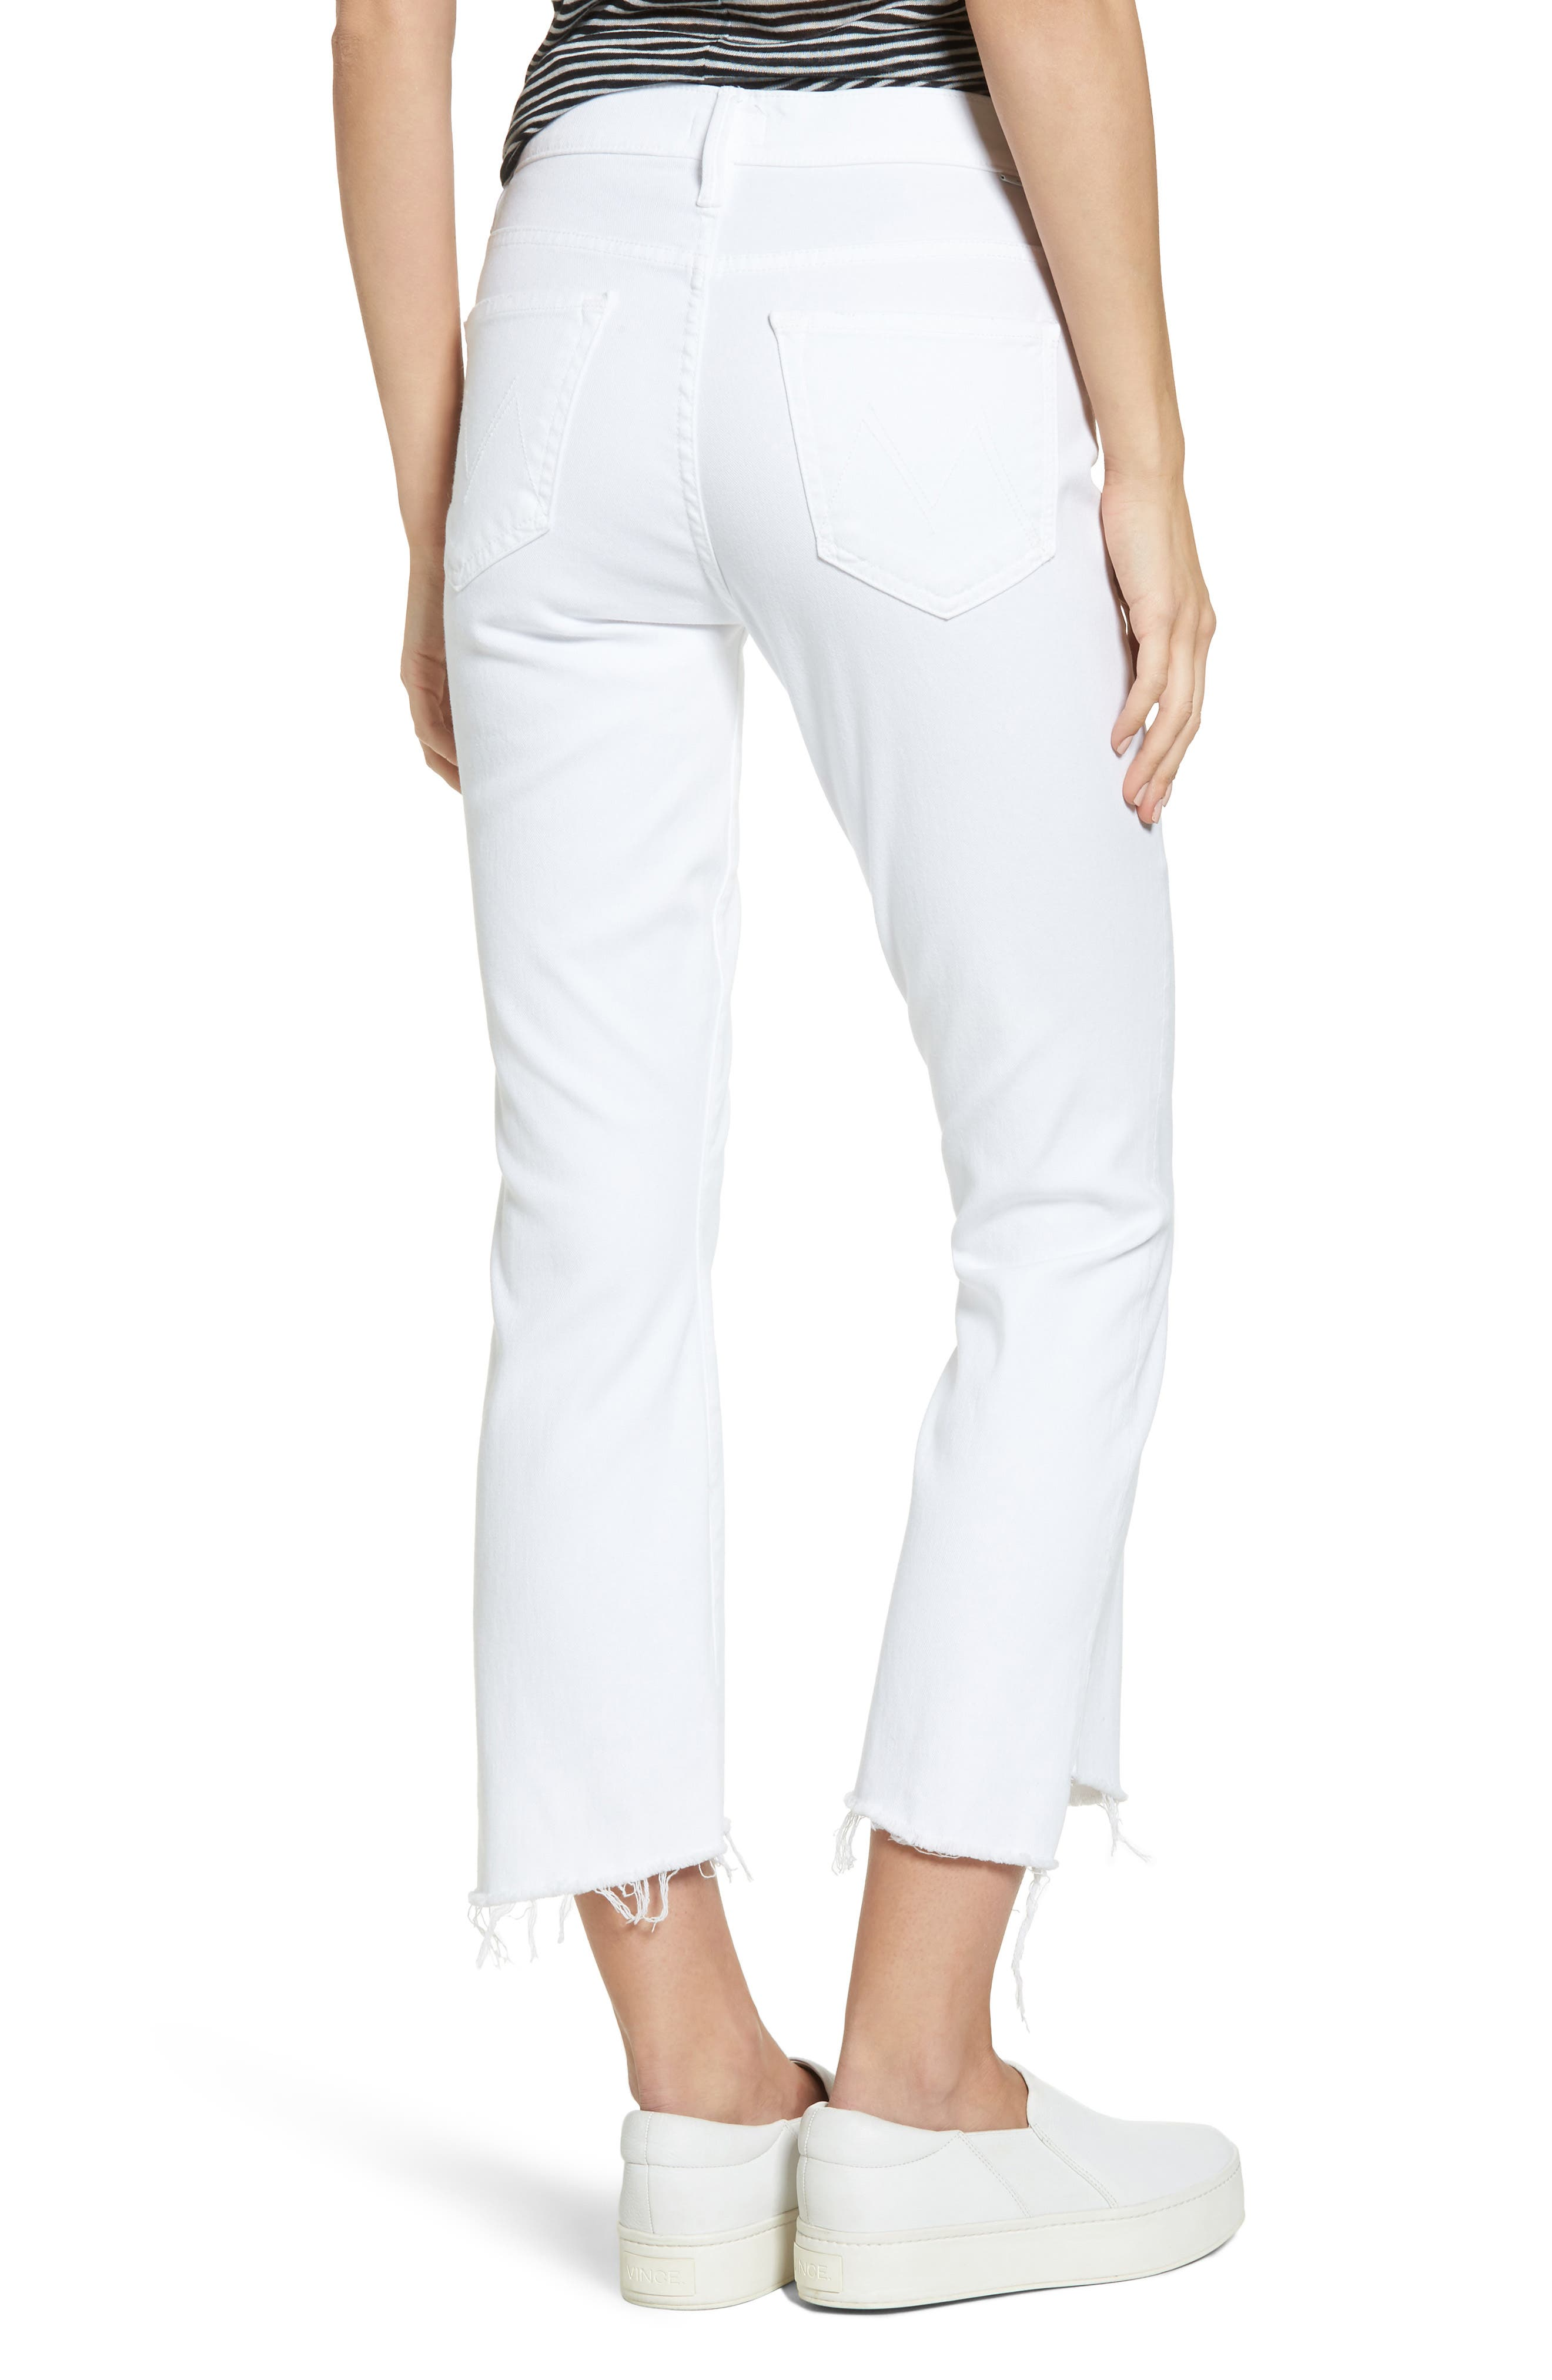 MOTHER,                             The Insider Step Hem Crop Bootcut Jeans,                             Alternate thumbnail 2, color,                             GLASS SLIPPER